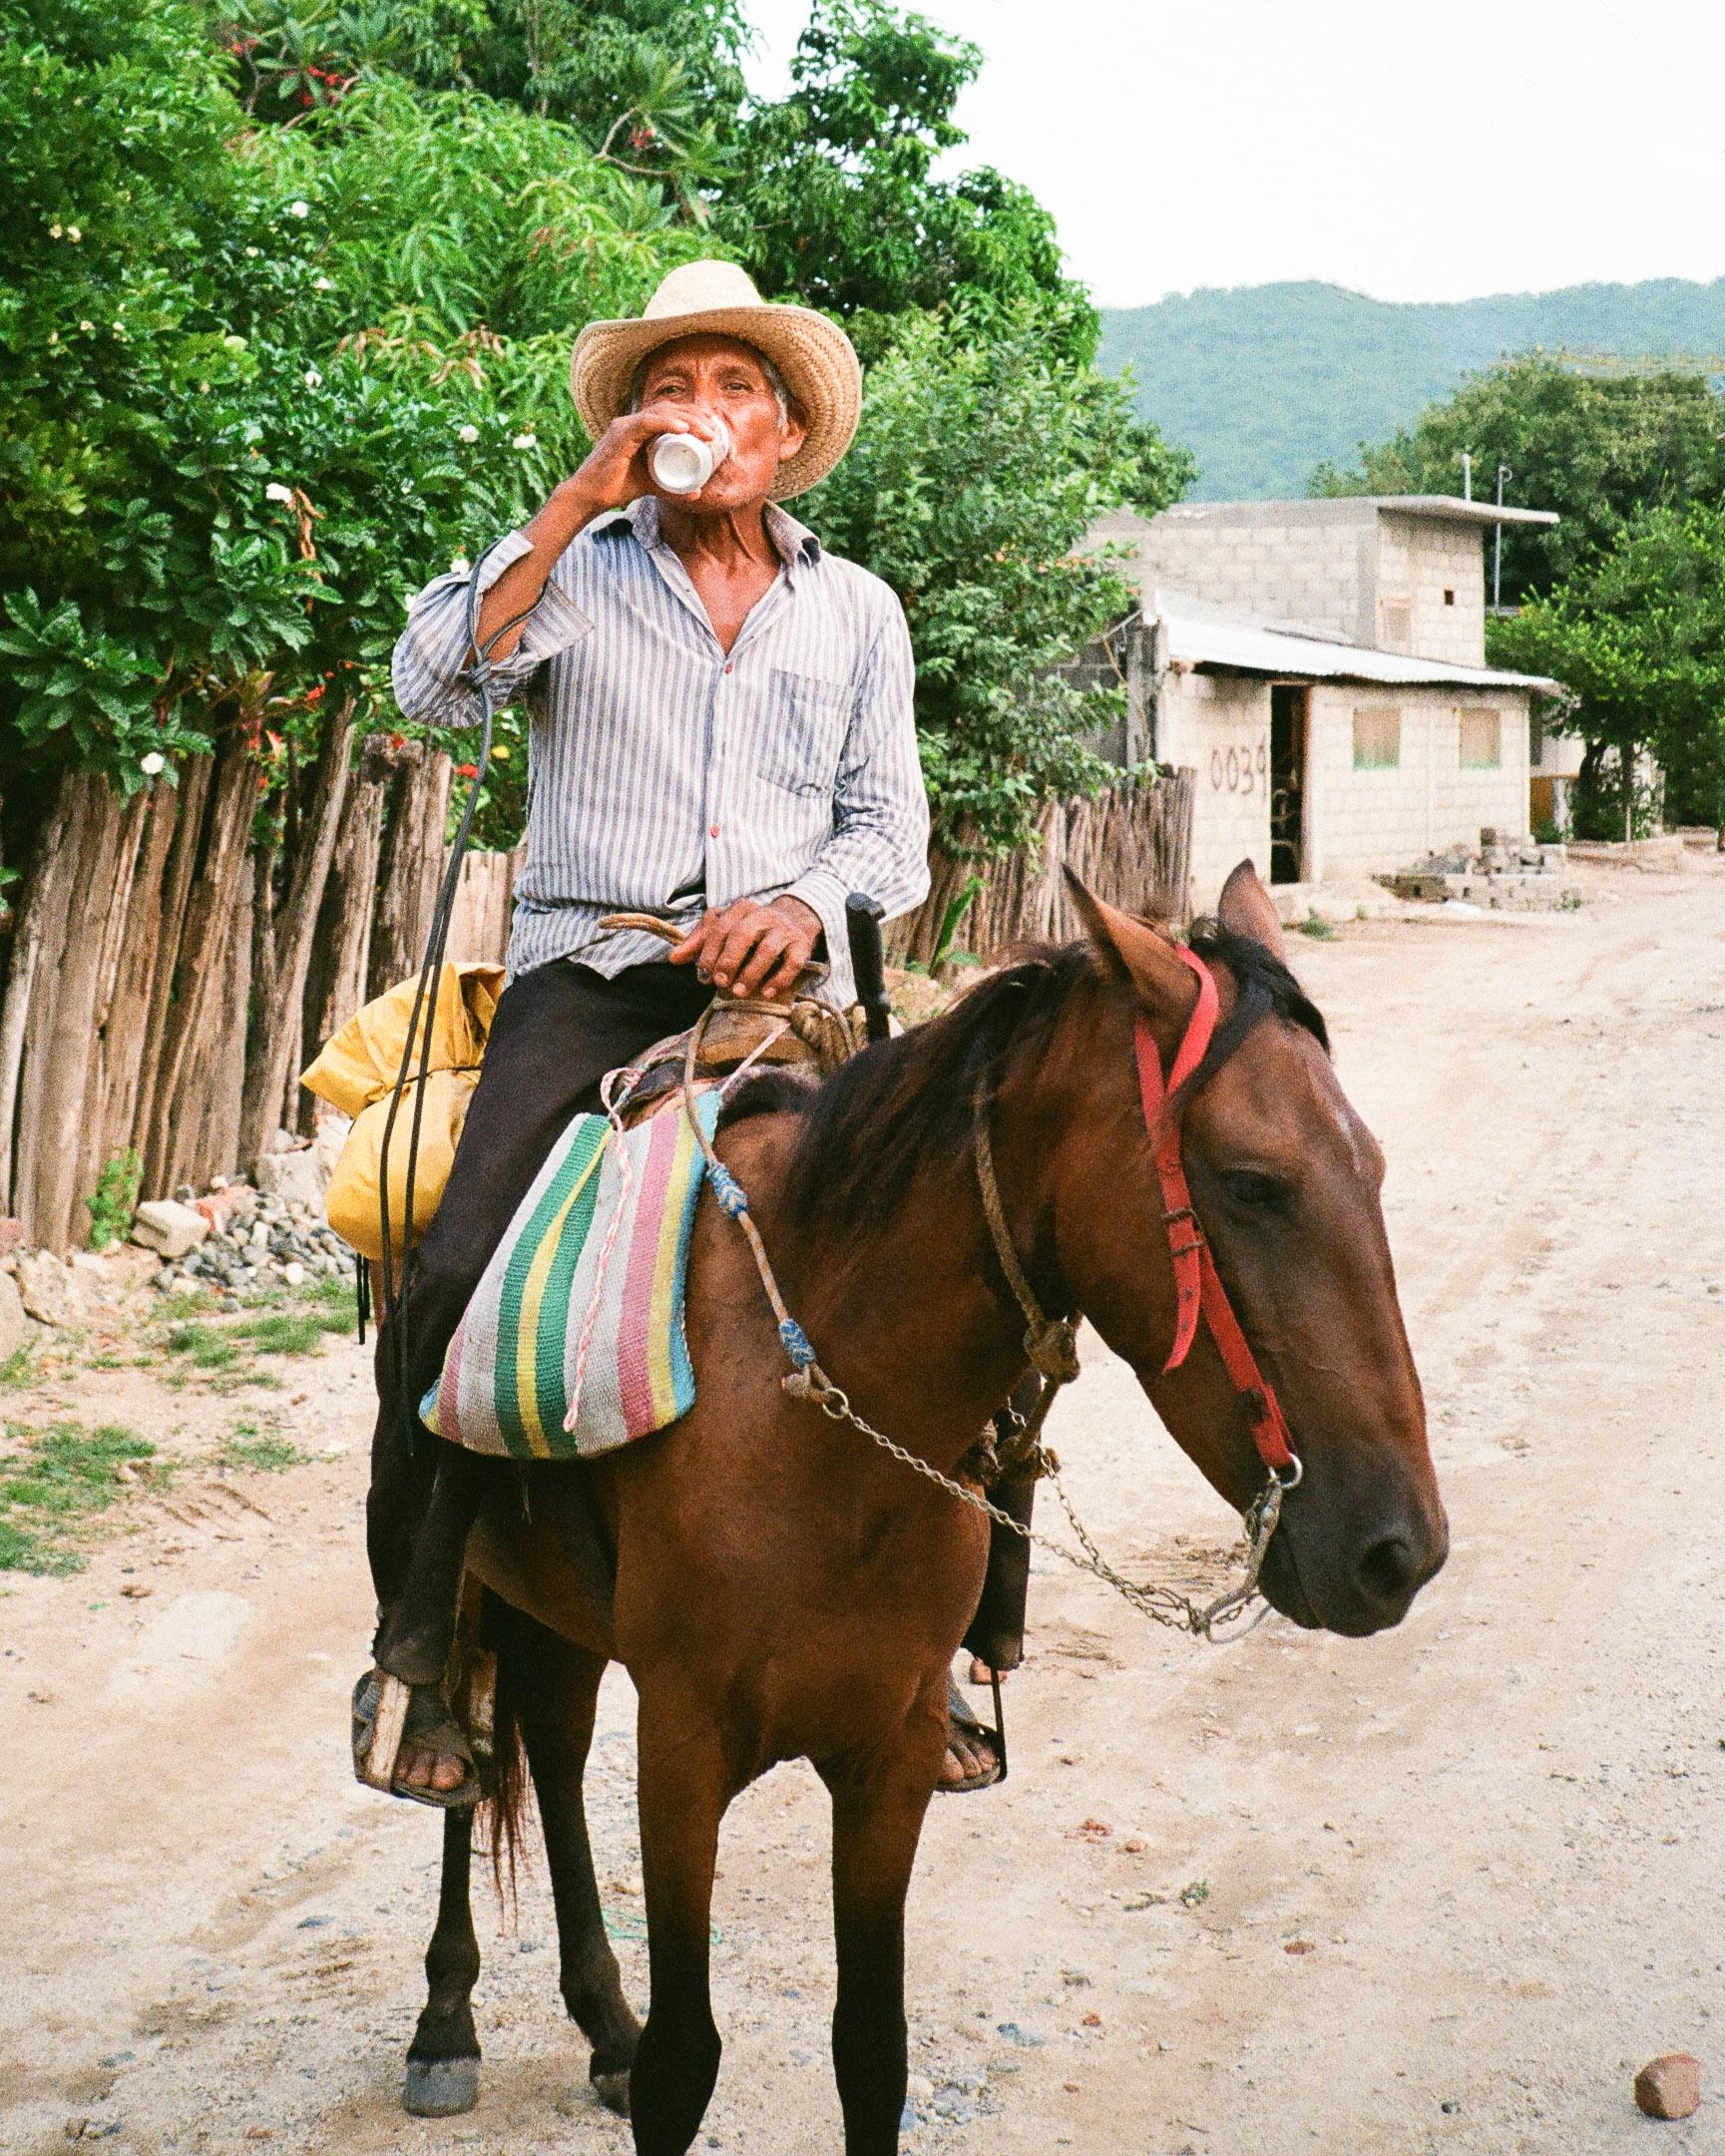 captainbarto-blog-adambartoshesky-model-nautica-client-mexico-surf-trip-mexican-mirage-september-2018--2.jpg